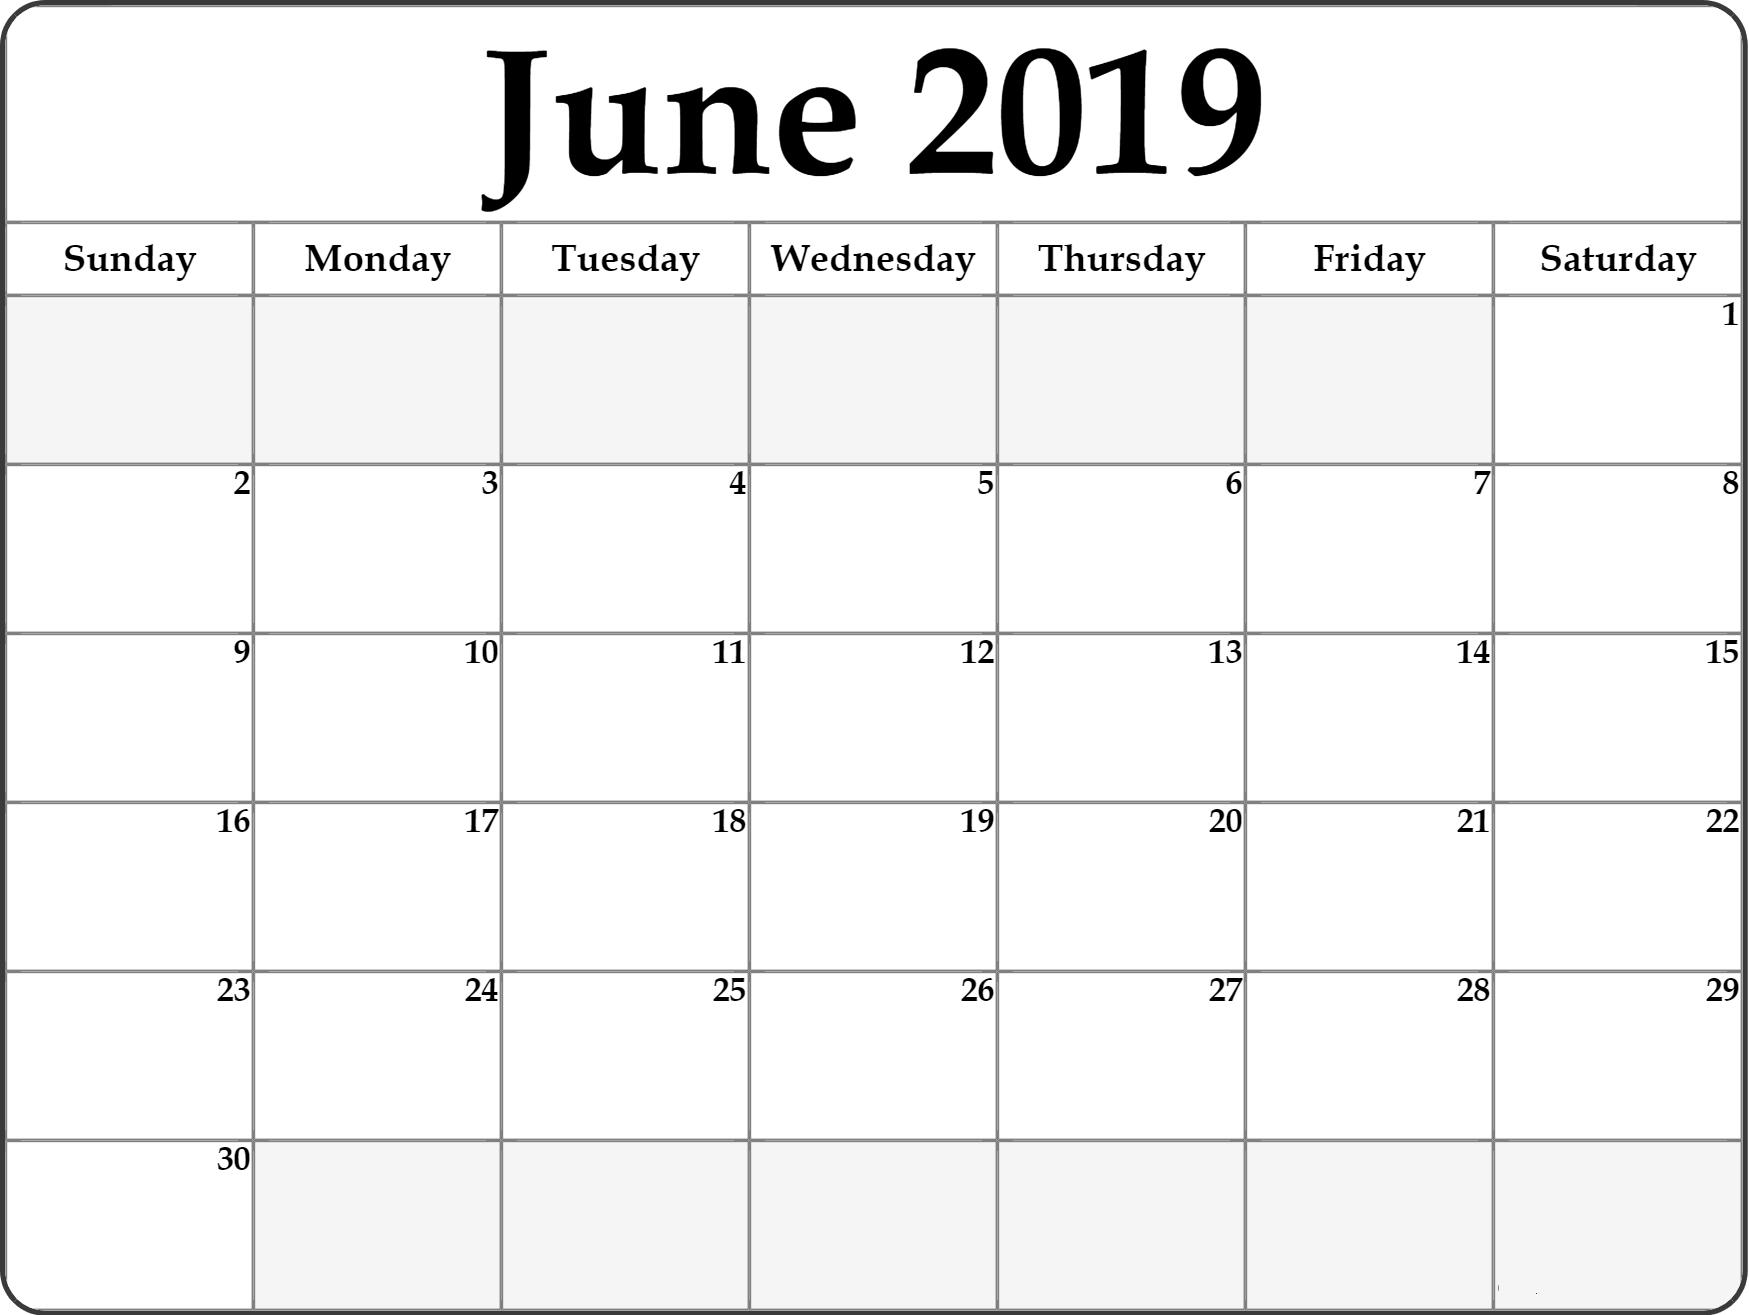 Free Printable June 2019 Calendar #portrait | June 2019 Calendar pertaining to Mini Blank June And July Calendar